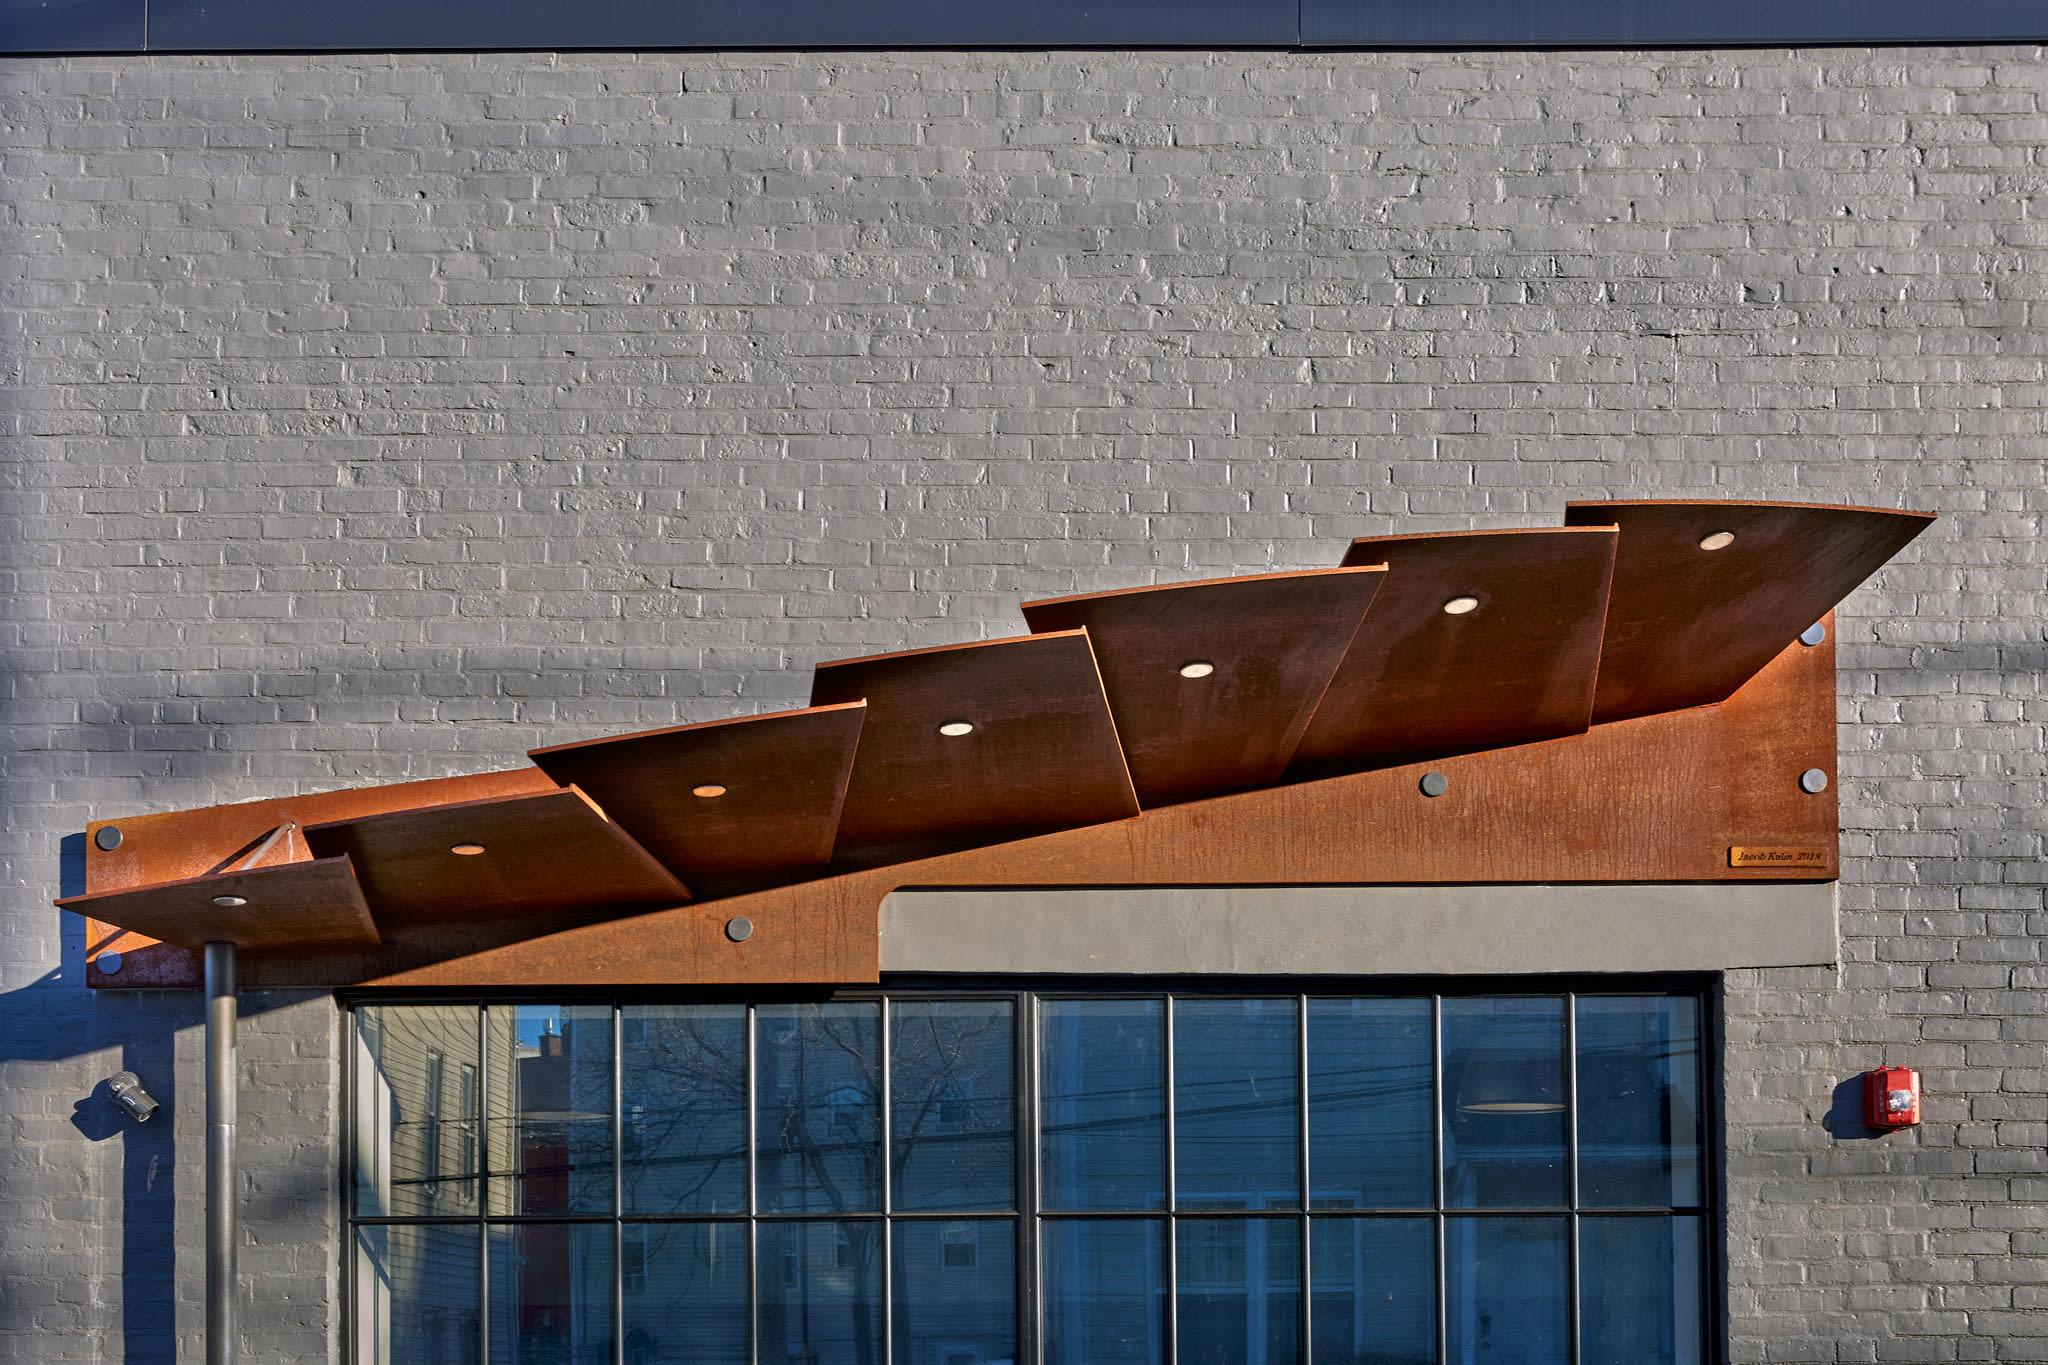 Sculptural Entrance Canopy